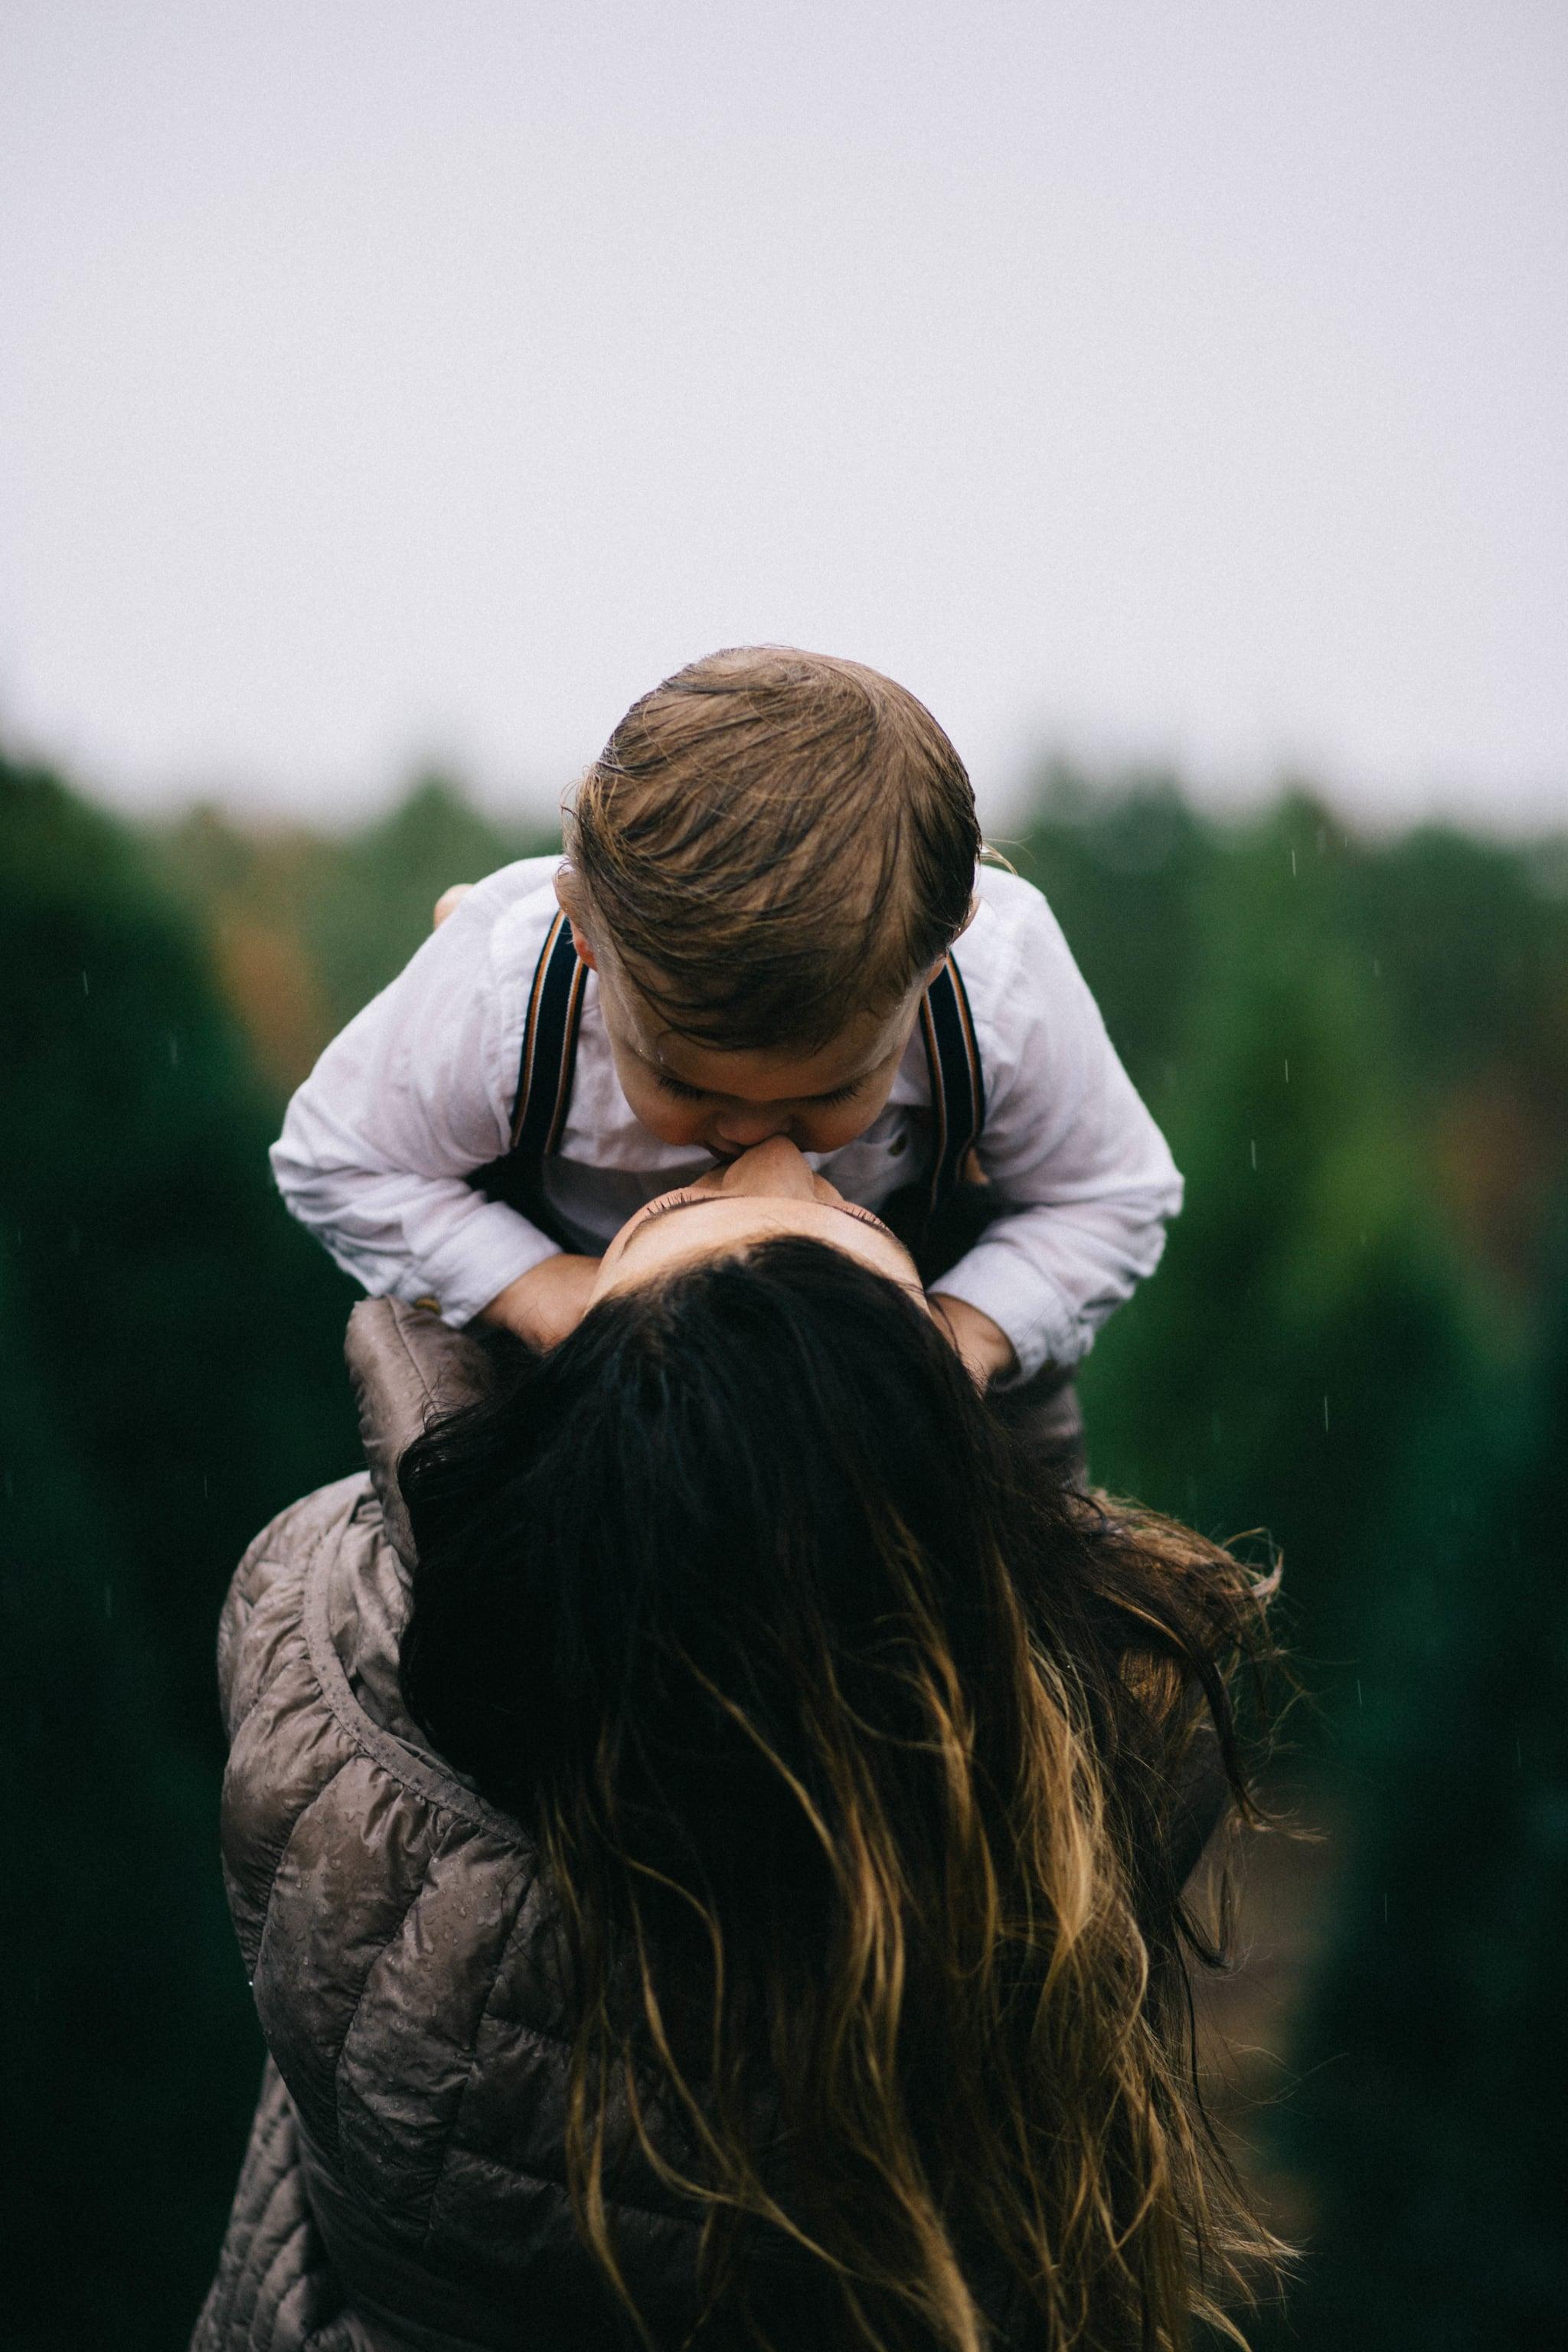 Single mom dating single dad advice on jimmy